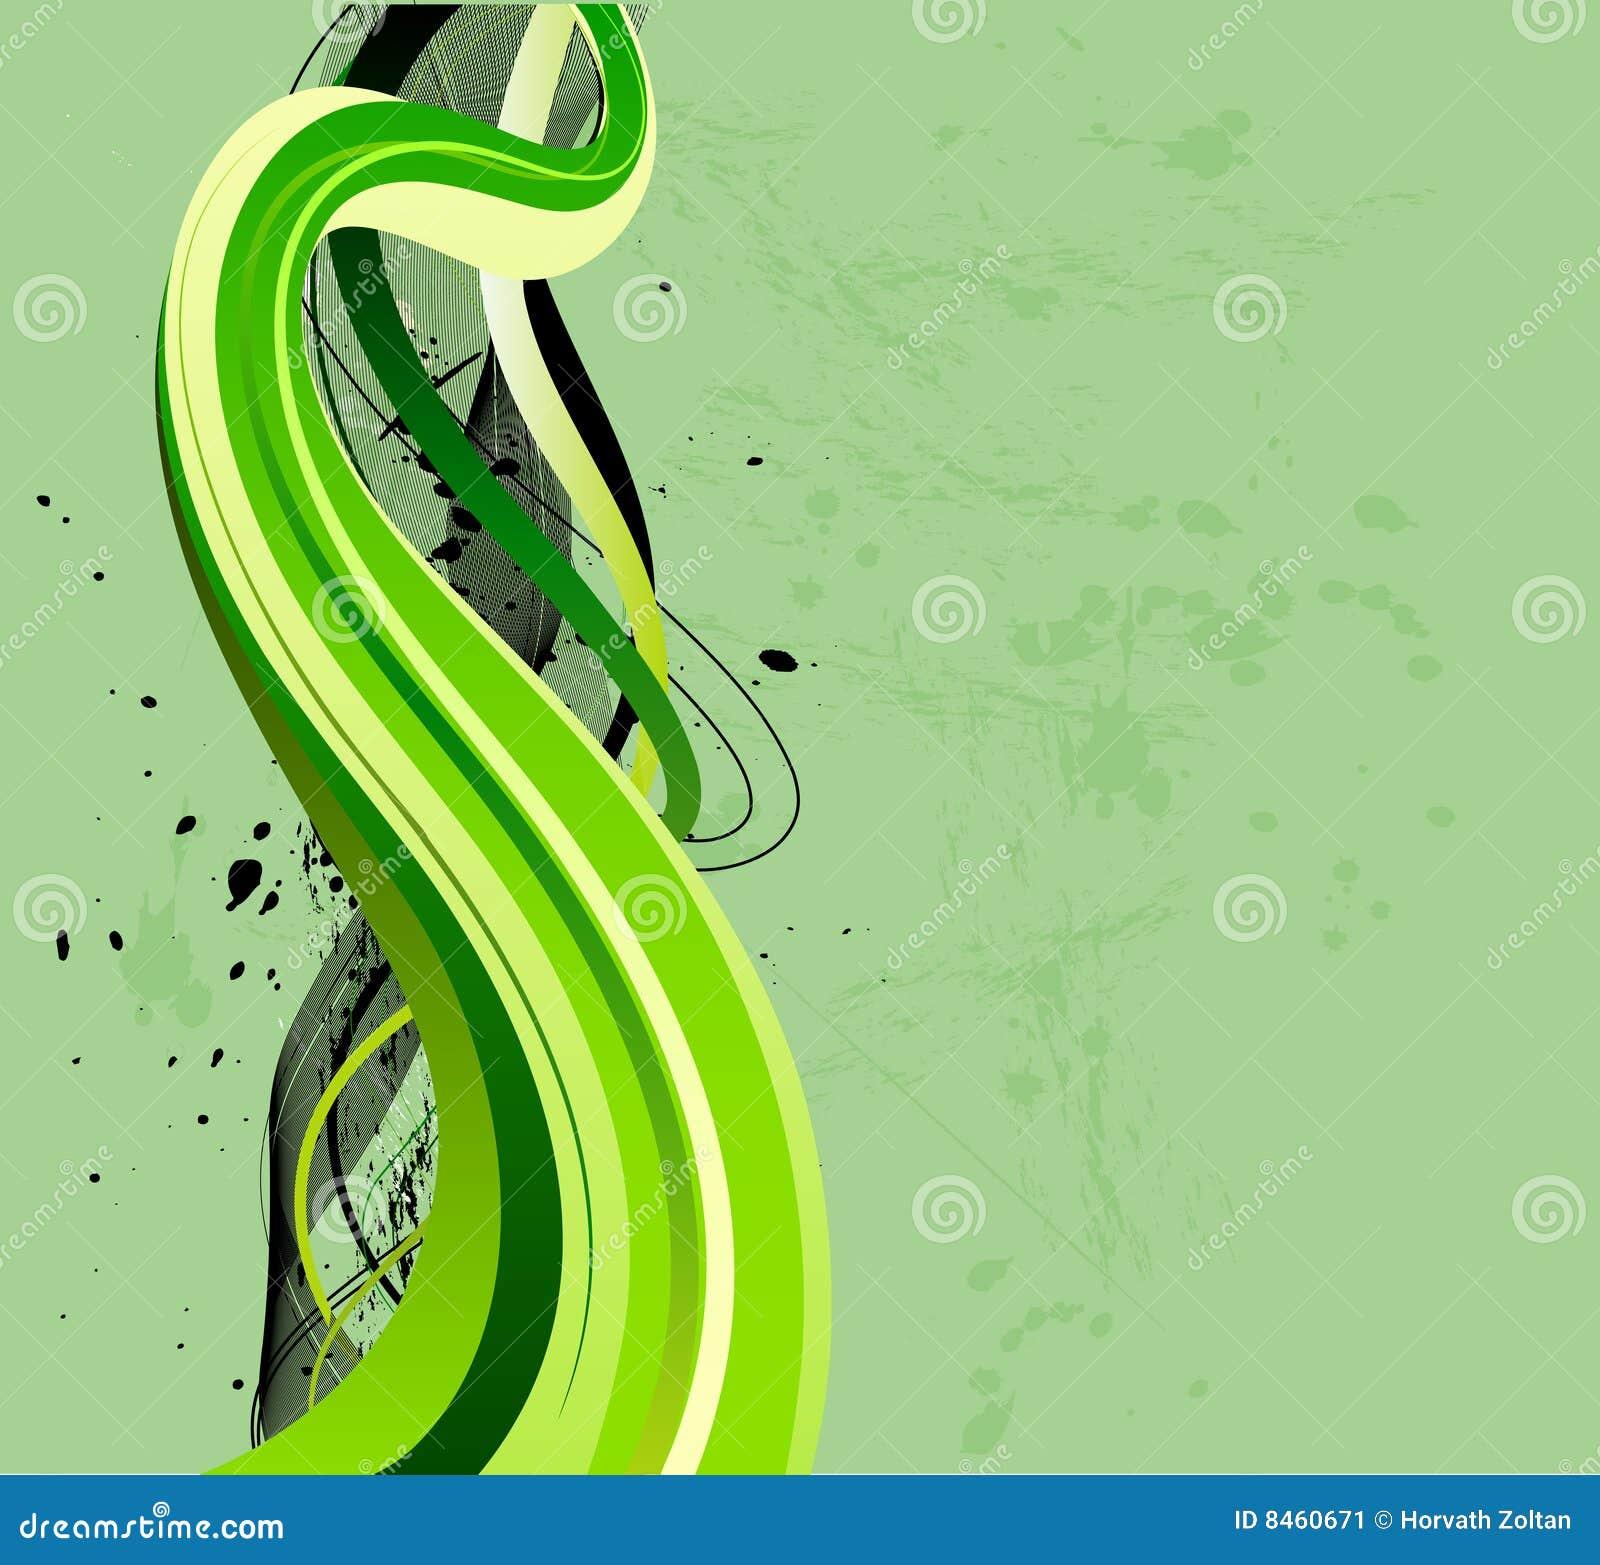 Flödande gröna waves